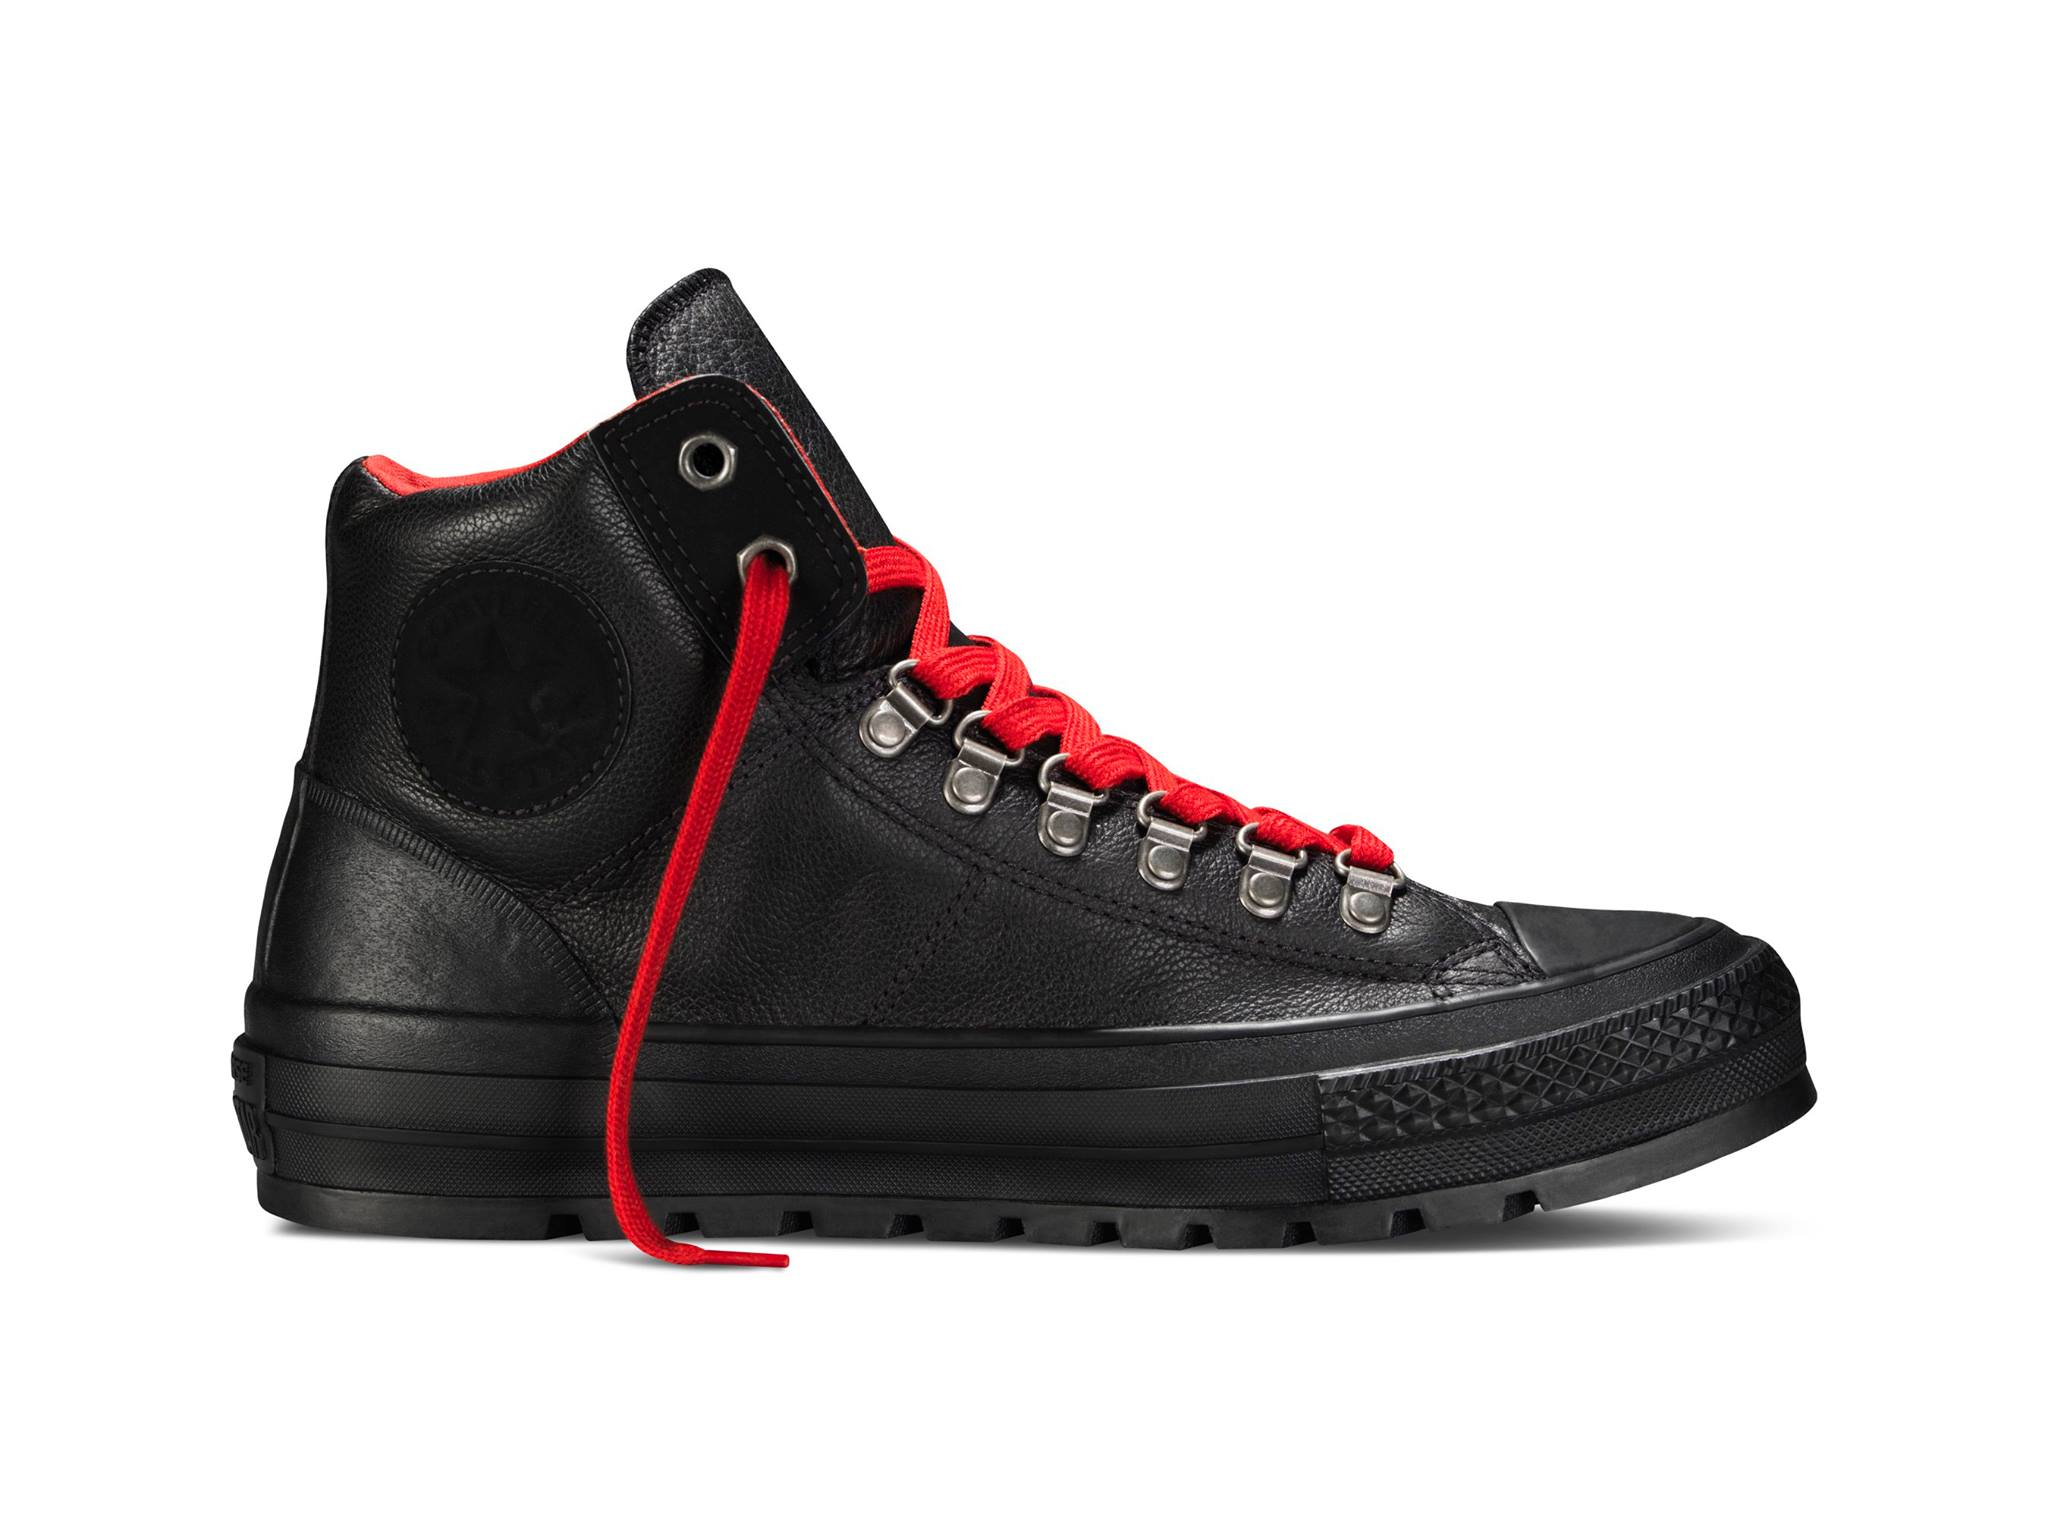 #Converse 一貫的帆布鞋鞋款,開始在鞋面材質上多了季節感的變化~